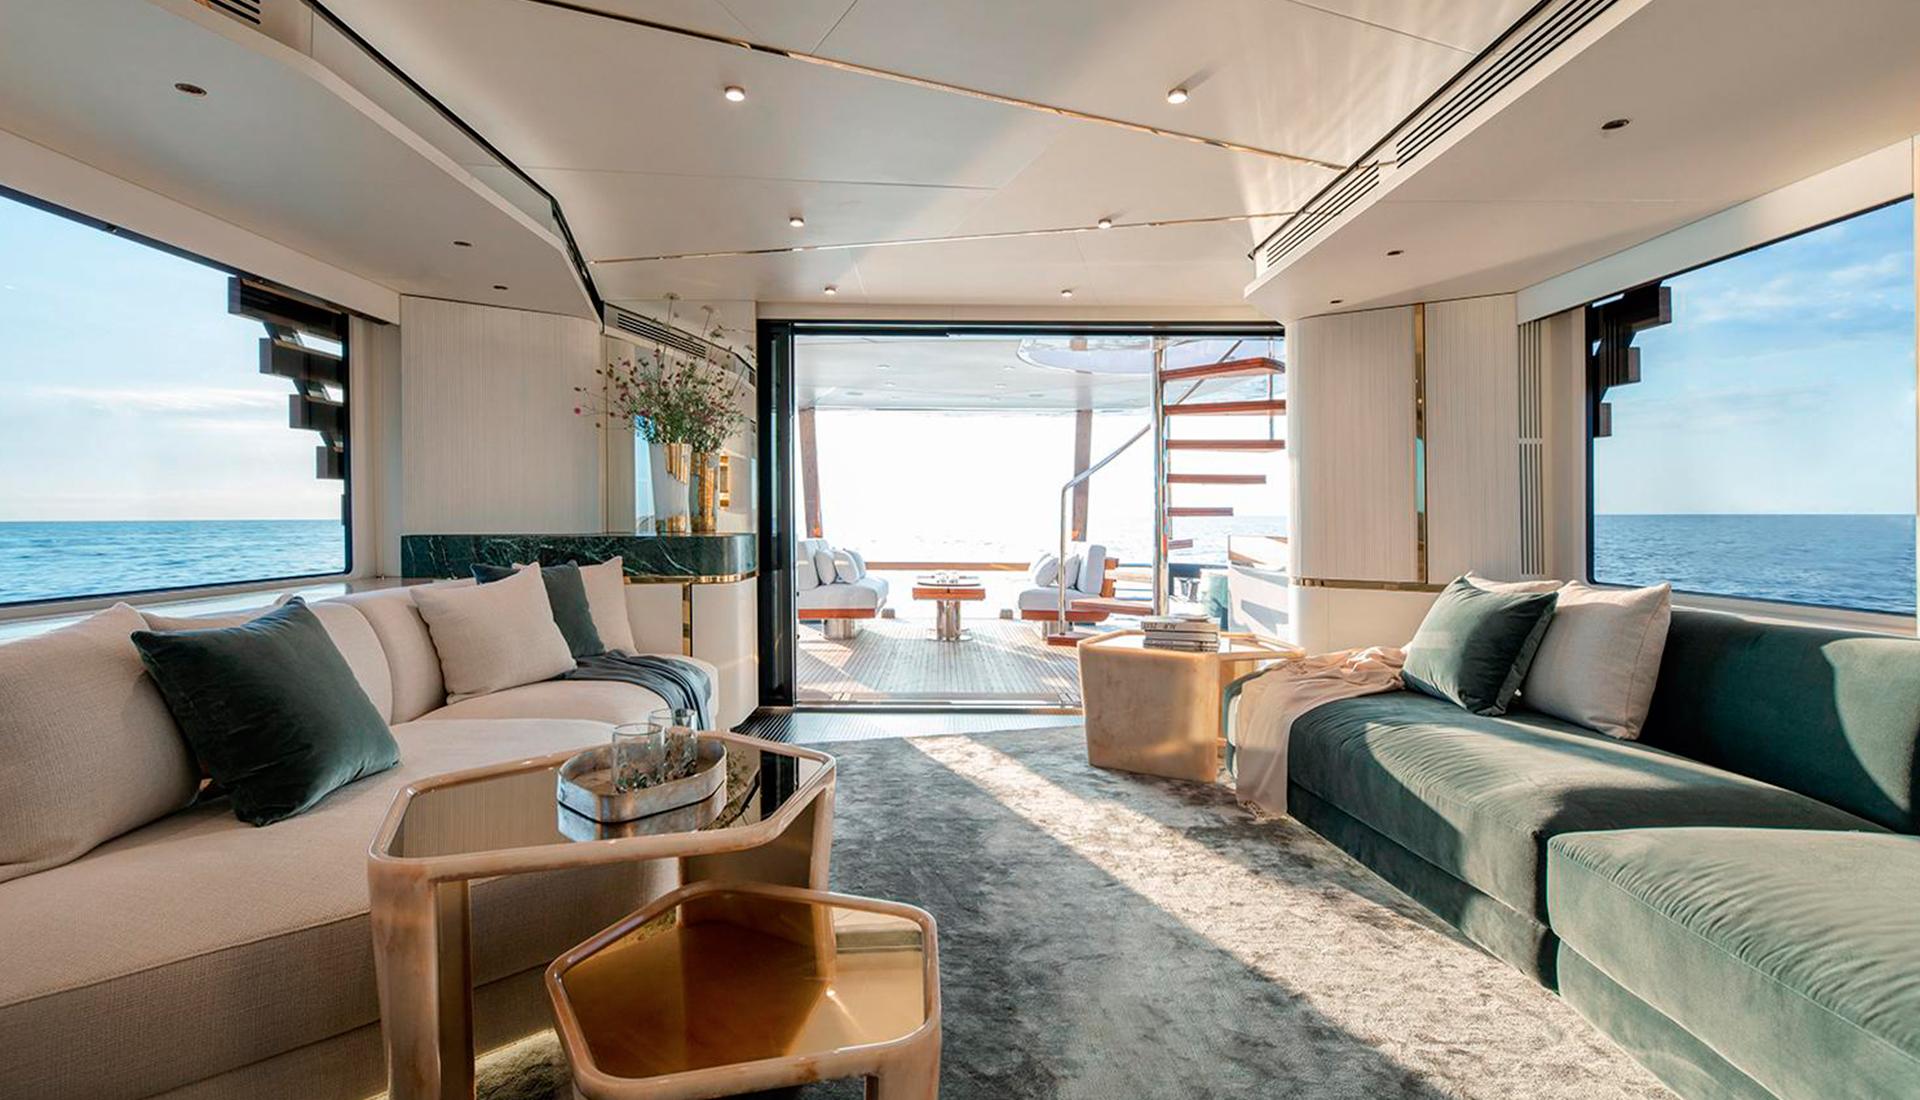 Винченцо де Котис спроектировал интерьеры яхты